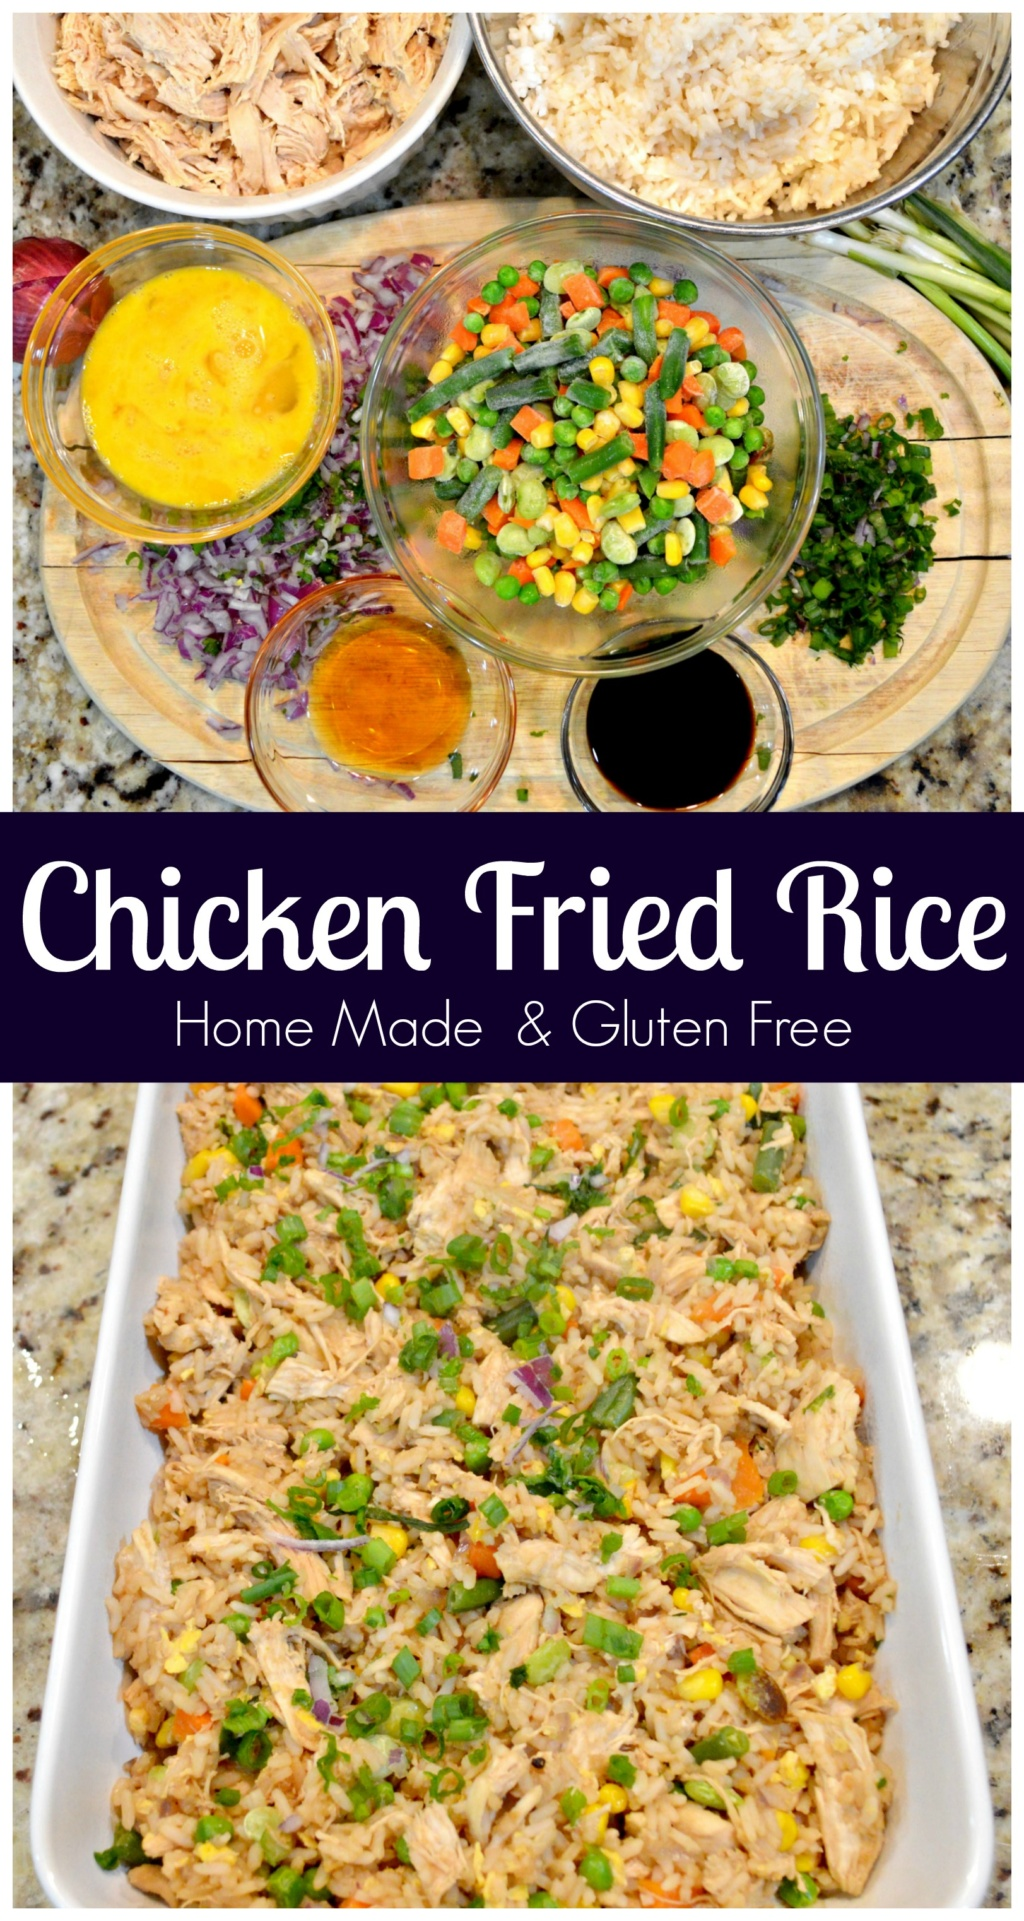 Chicken Fried Rice – Home Made & Gluten Free